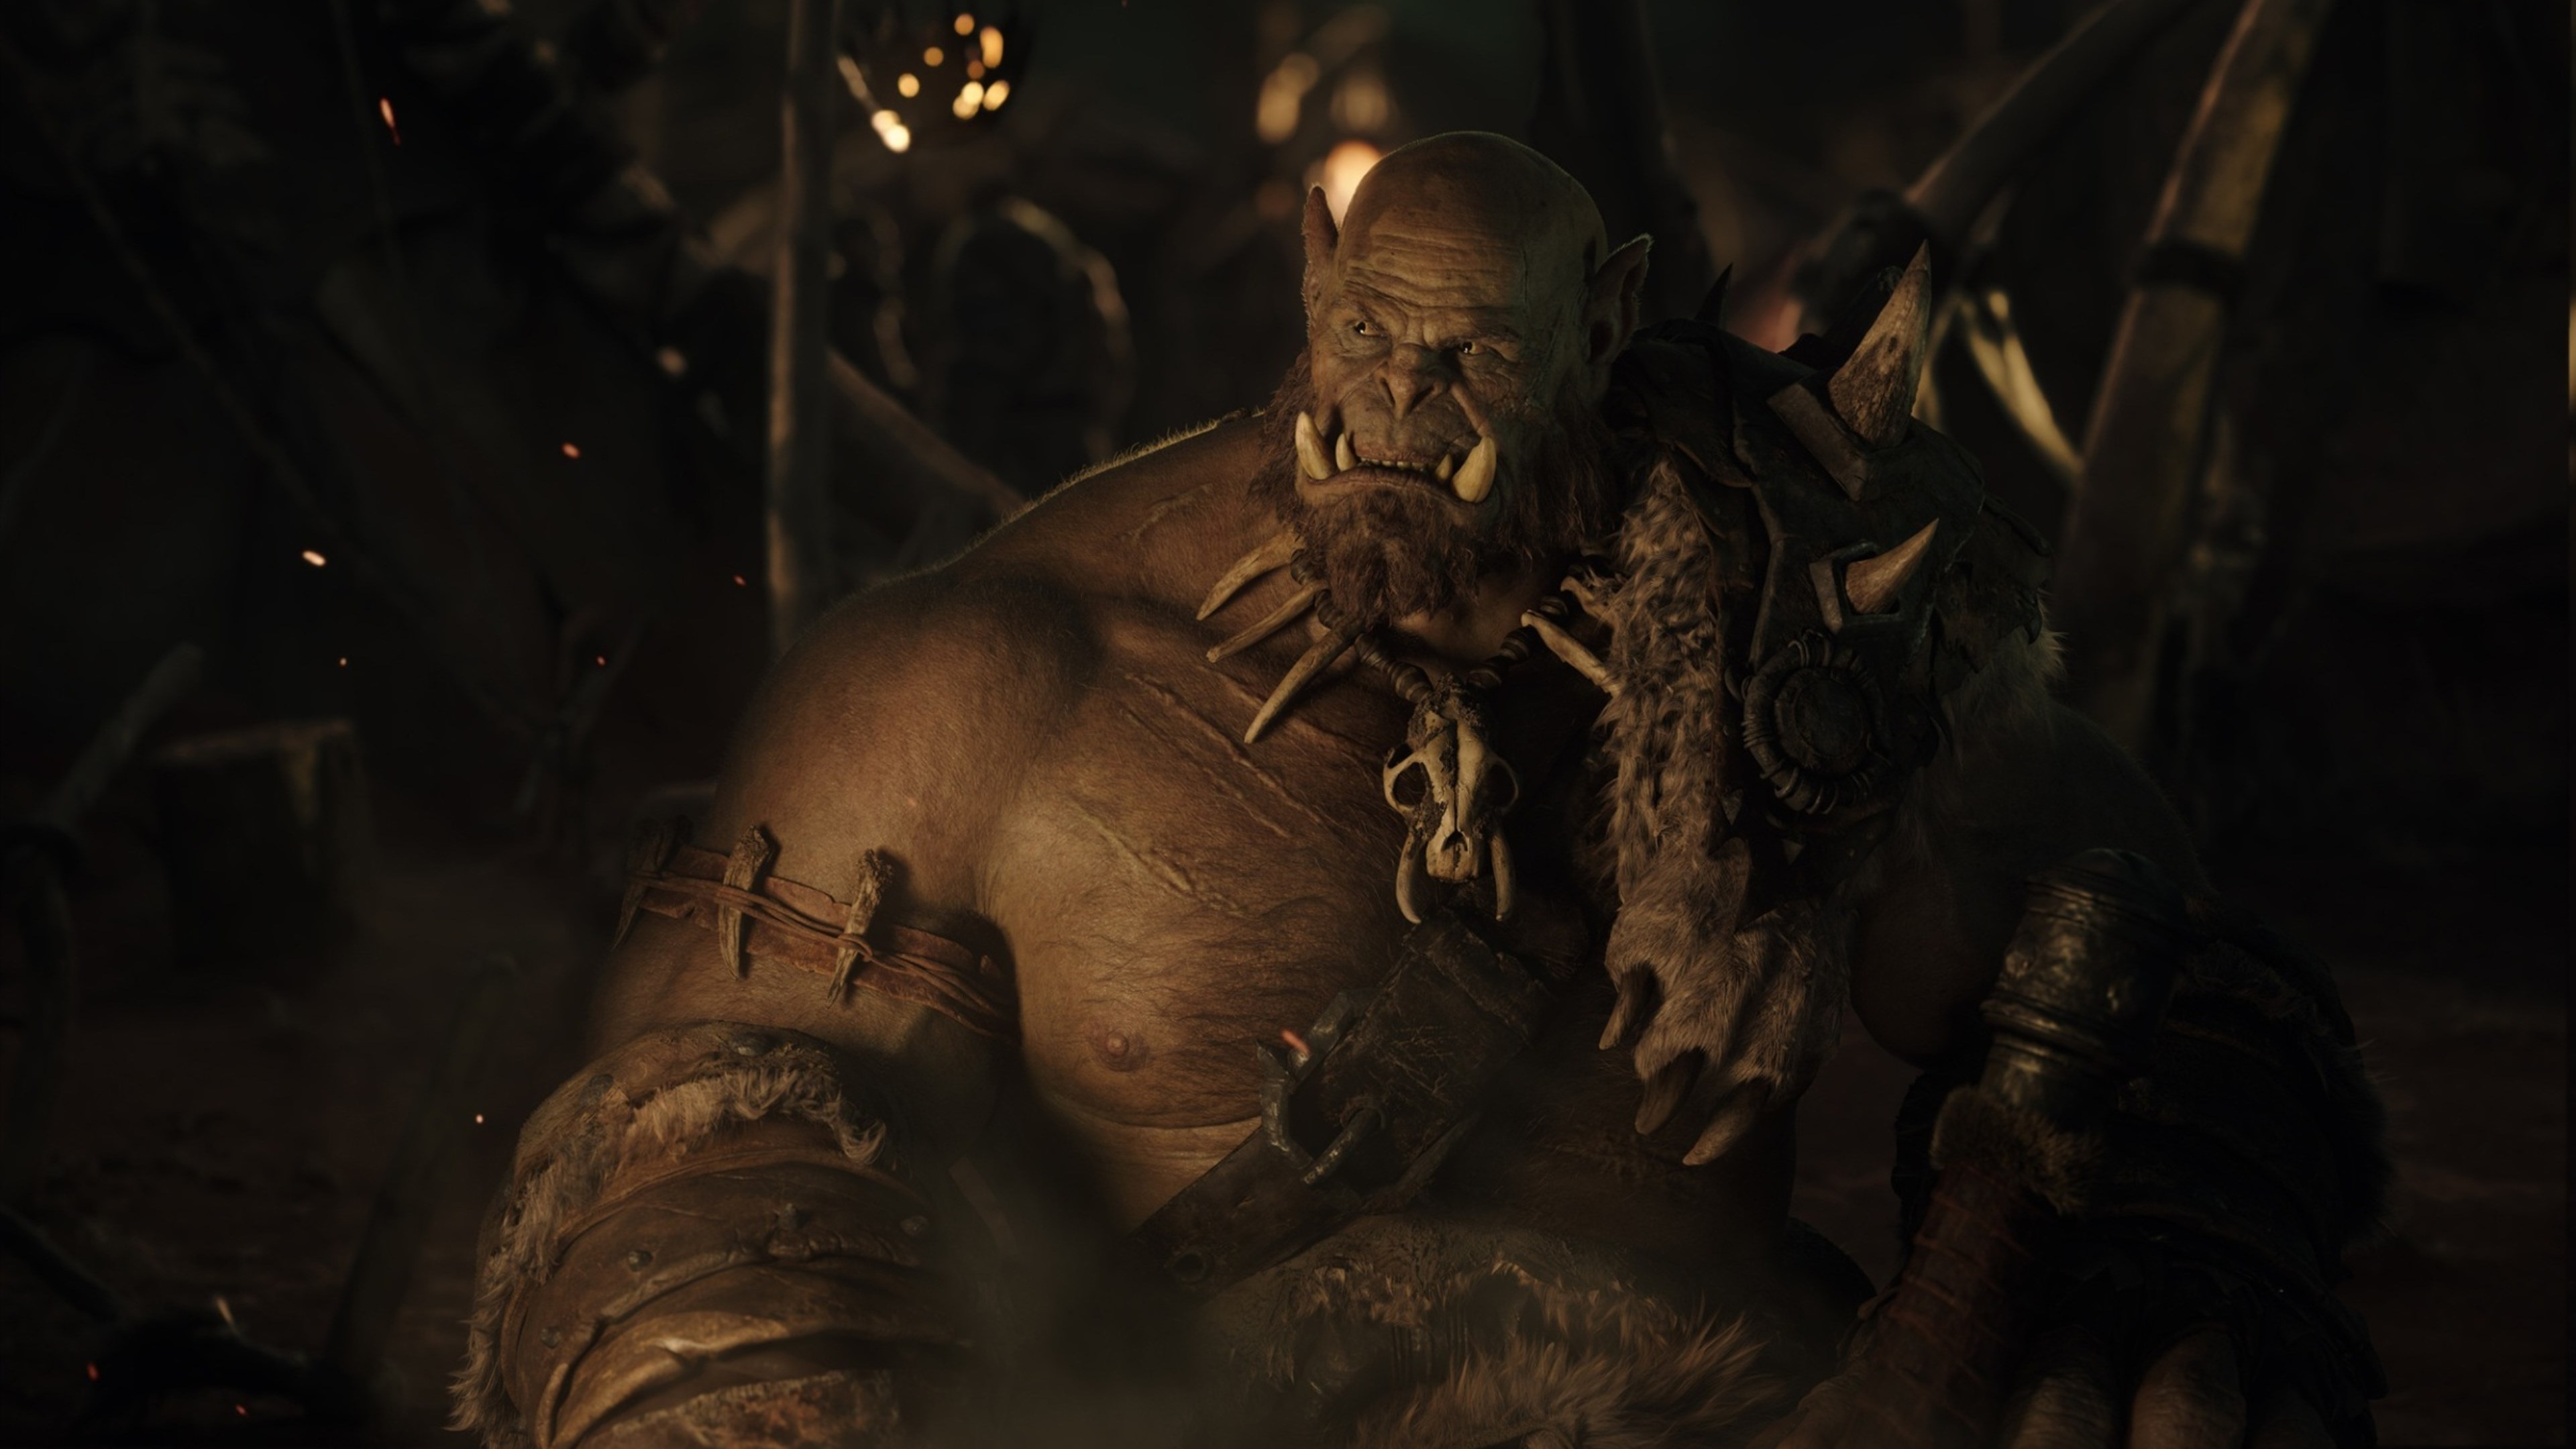 Wallpaper 4k Orgrim In Warcraft 2016 Movies Wallpapers